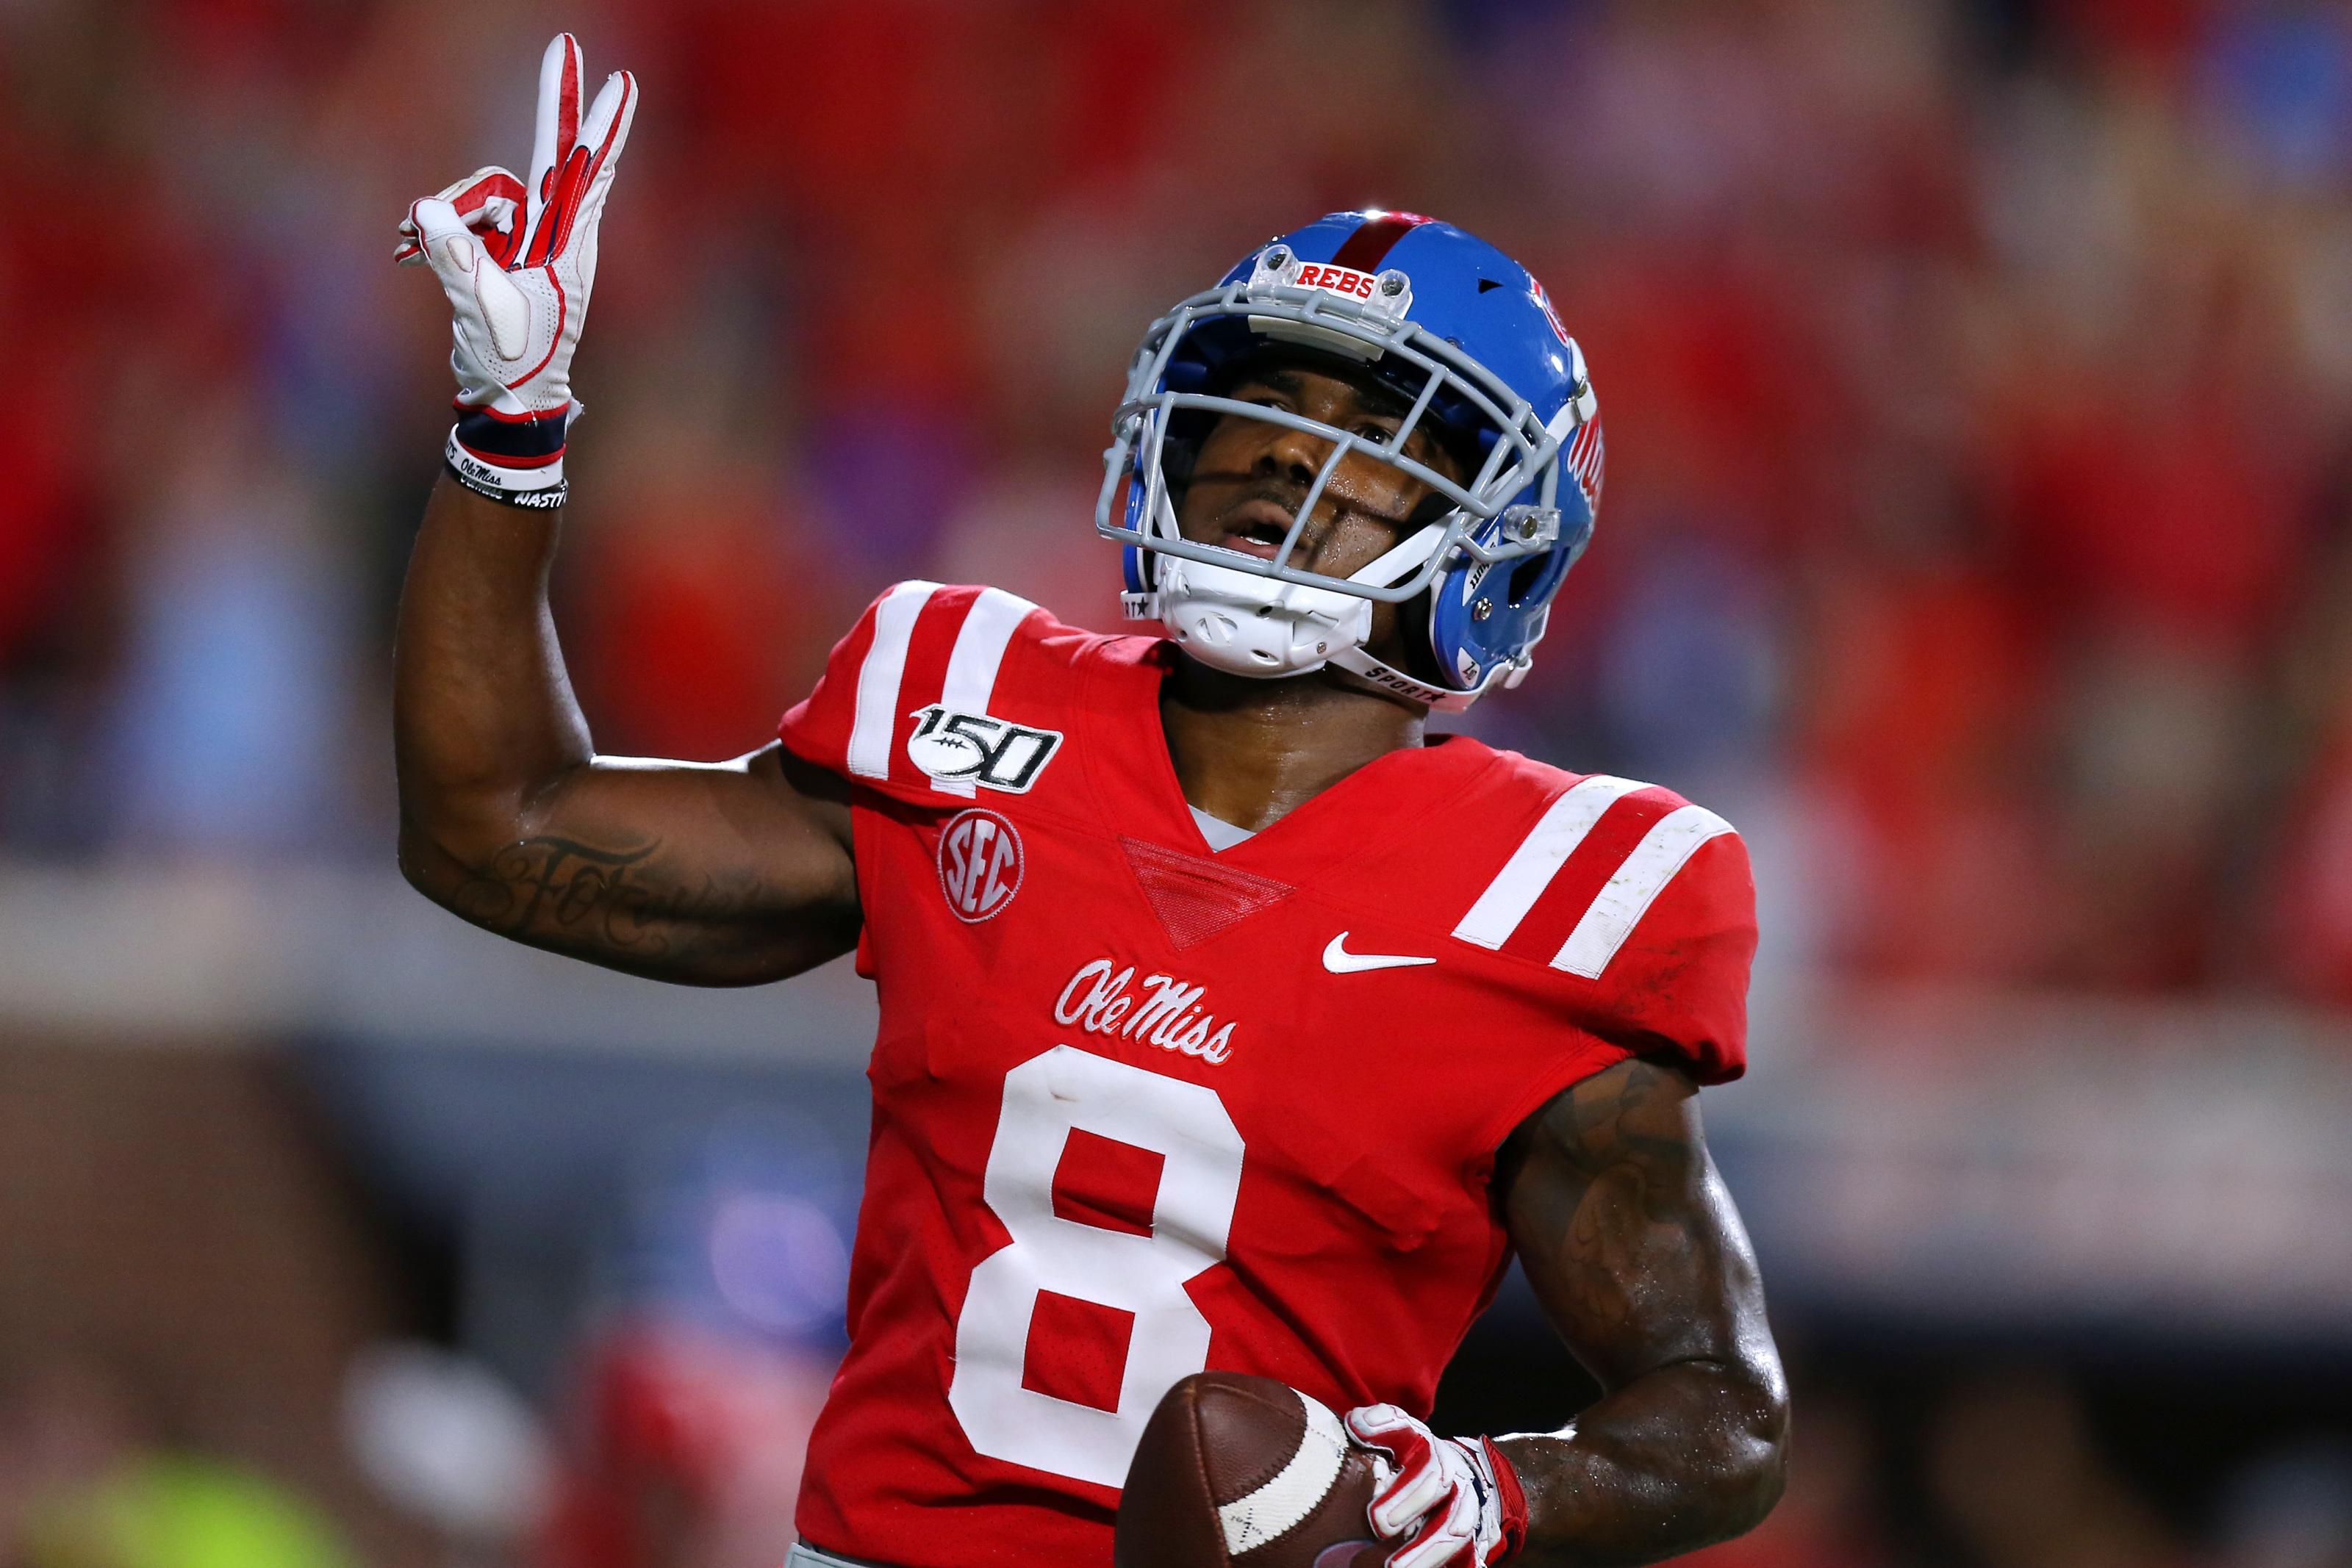 Ole Miss WR Elijah Moore explodes onto 2021 NFL Draft radar